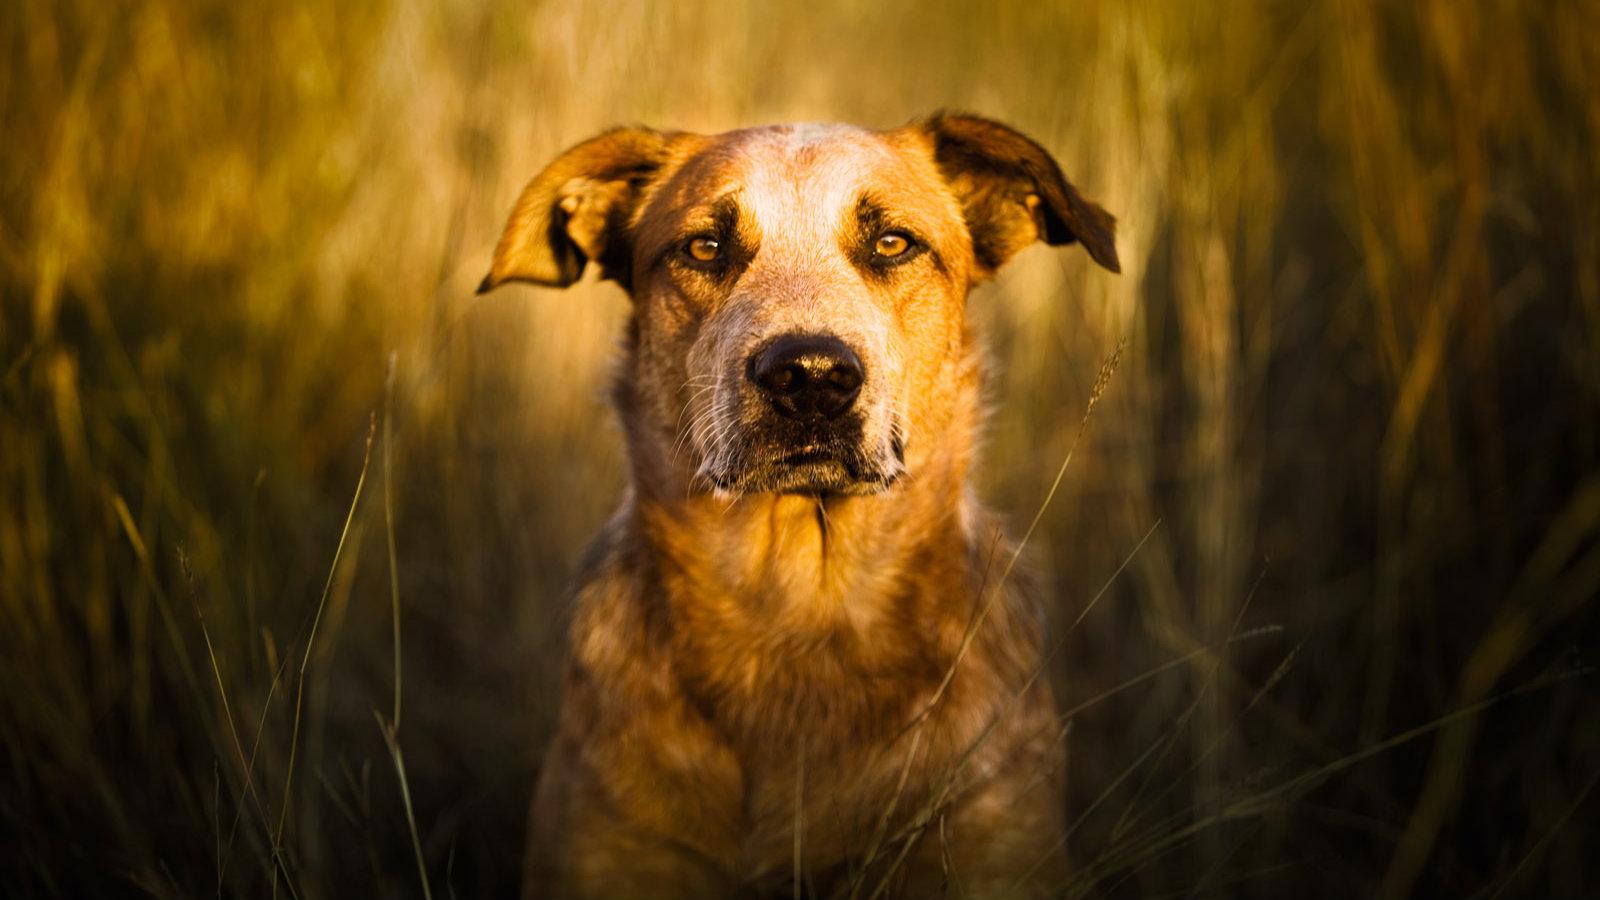 dogs main Richard_Schultz. jpg